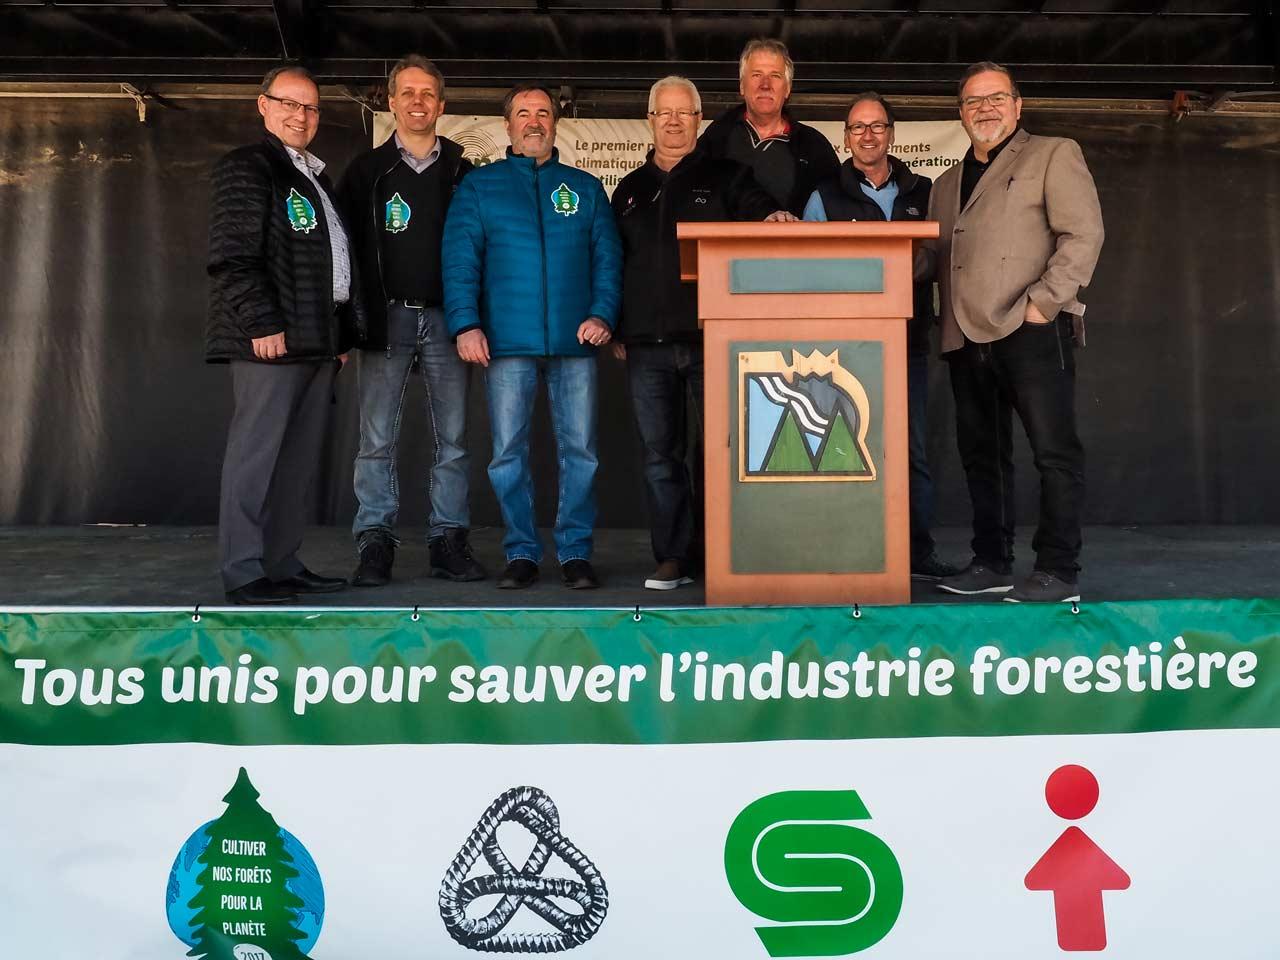 Grande marche forestière de Dolbeau-Mistassini le 30 avril 2017